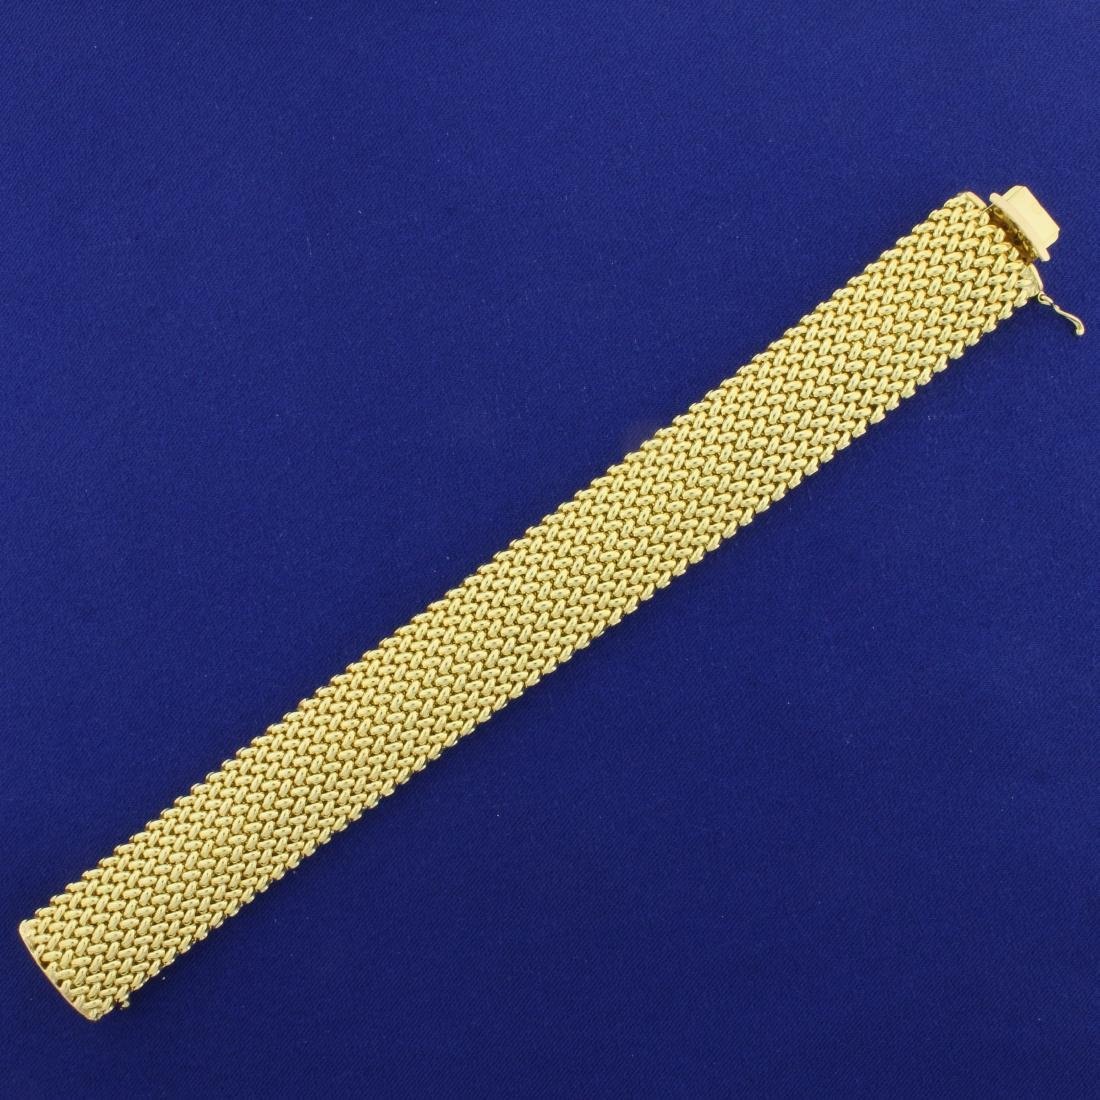 Italian Made Wide Woven Design Gold Bracelet in 14K